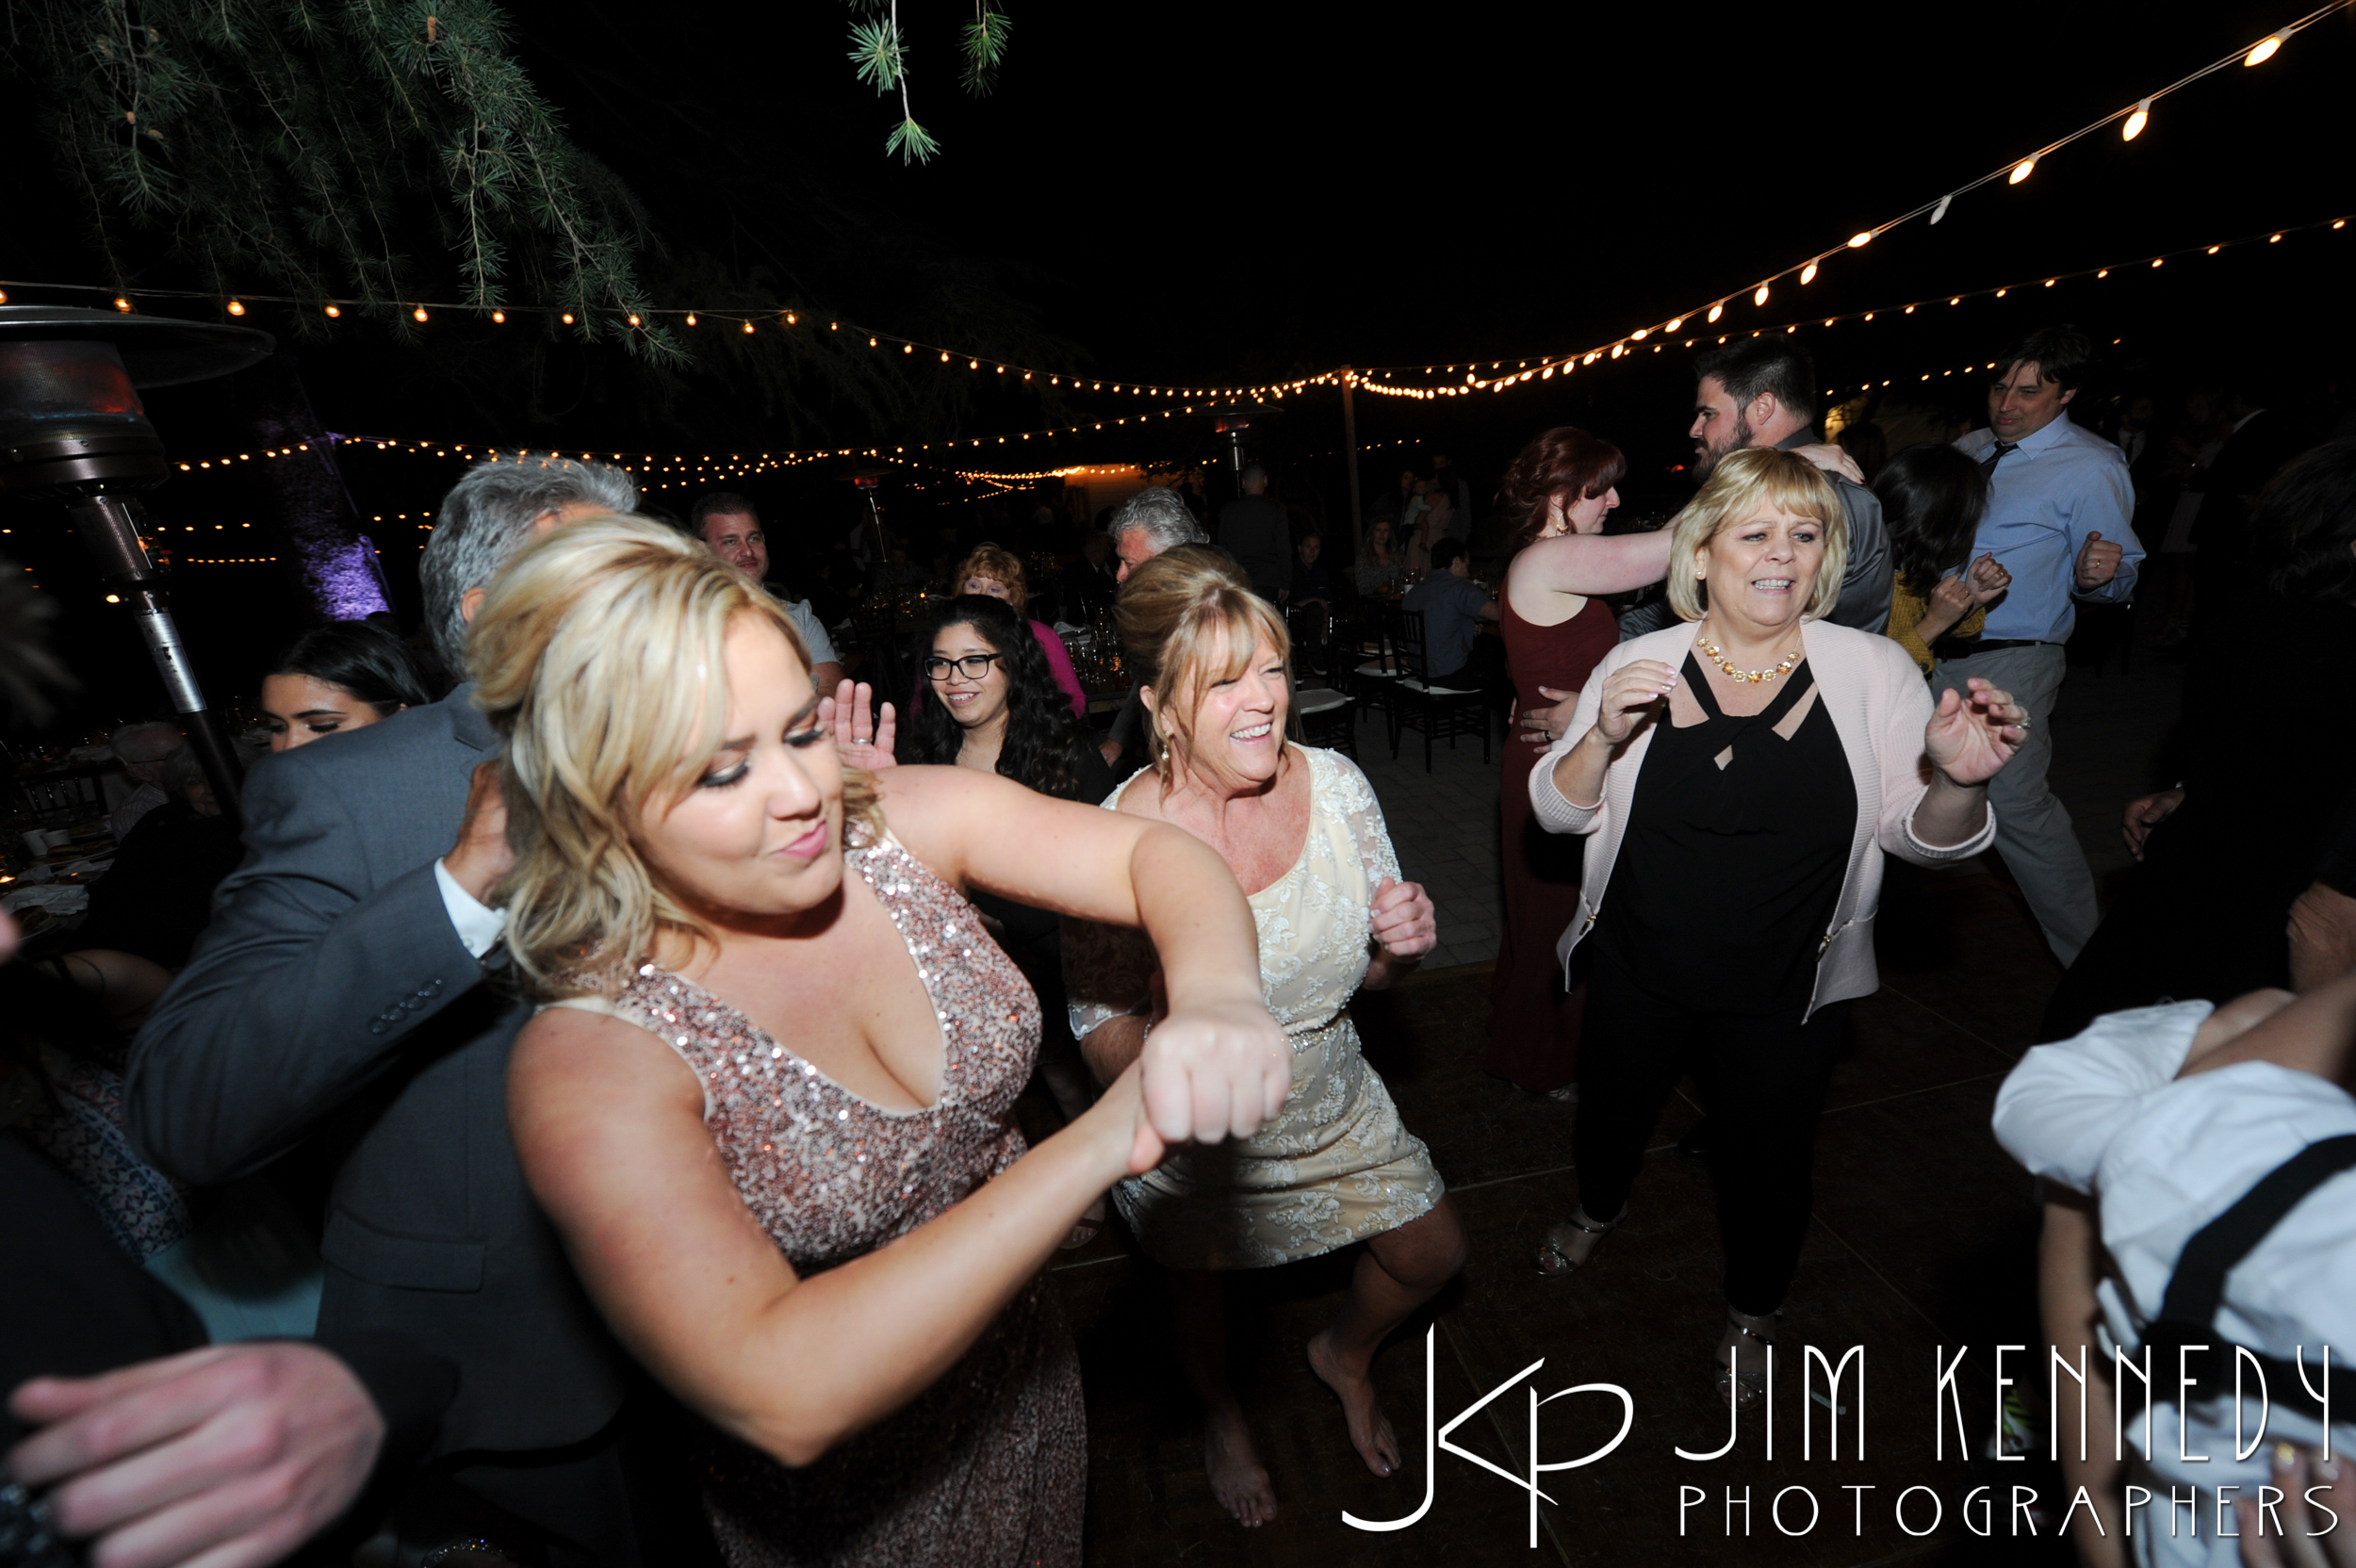 jim_kennedy_photographers_highland_springs_wedding_caitlyn_0206.jpg